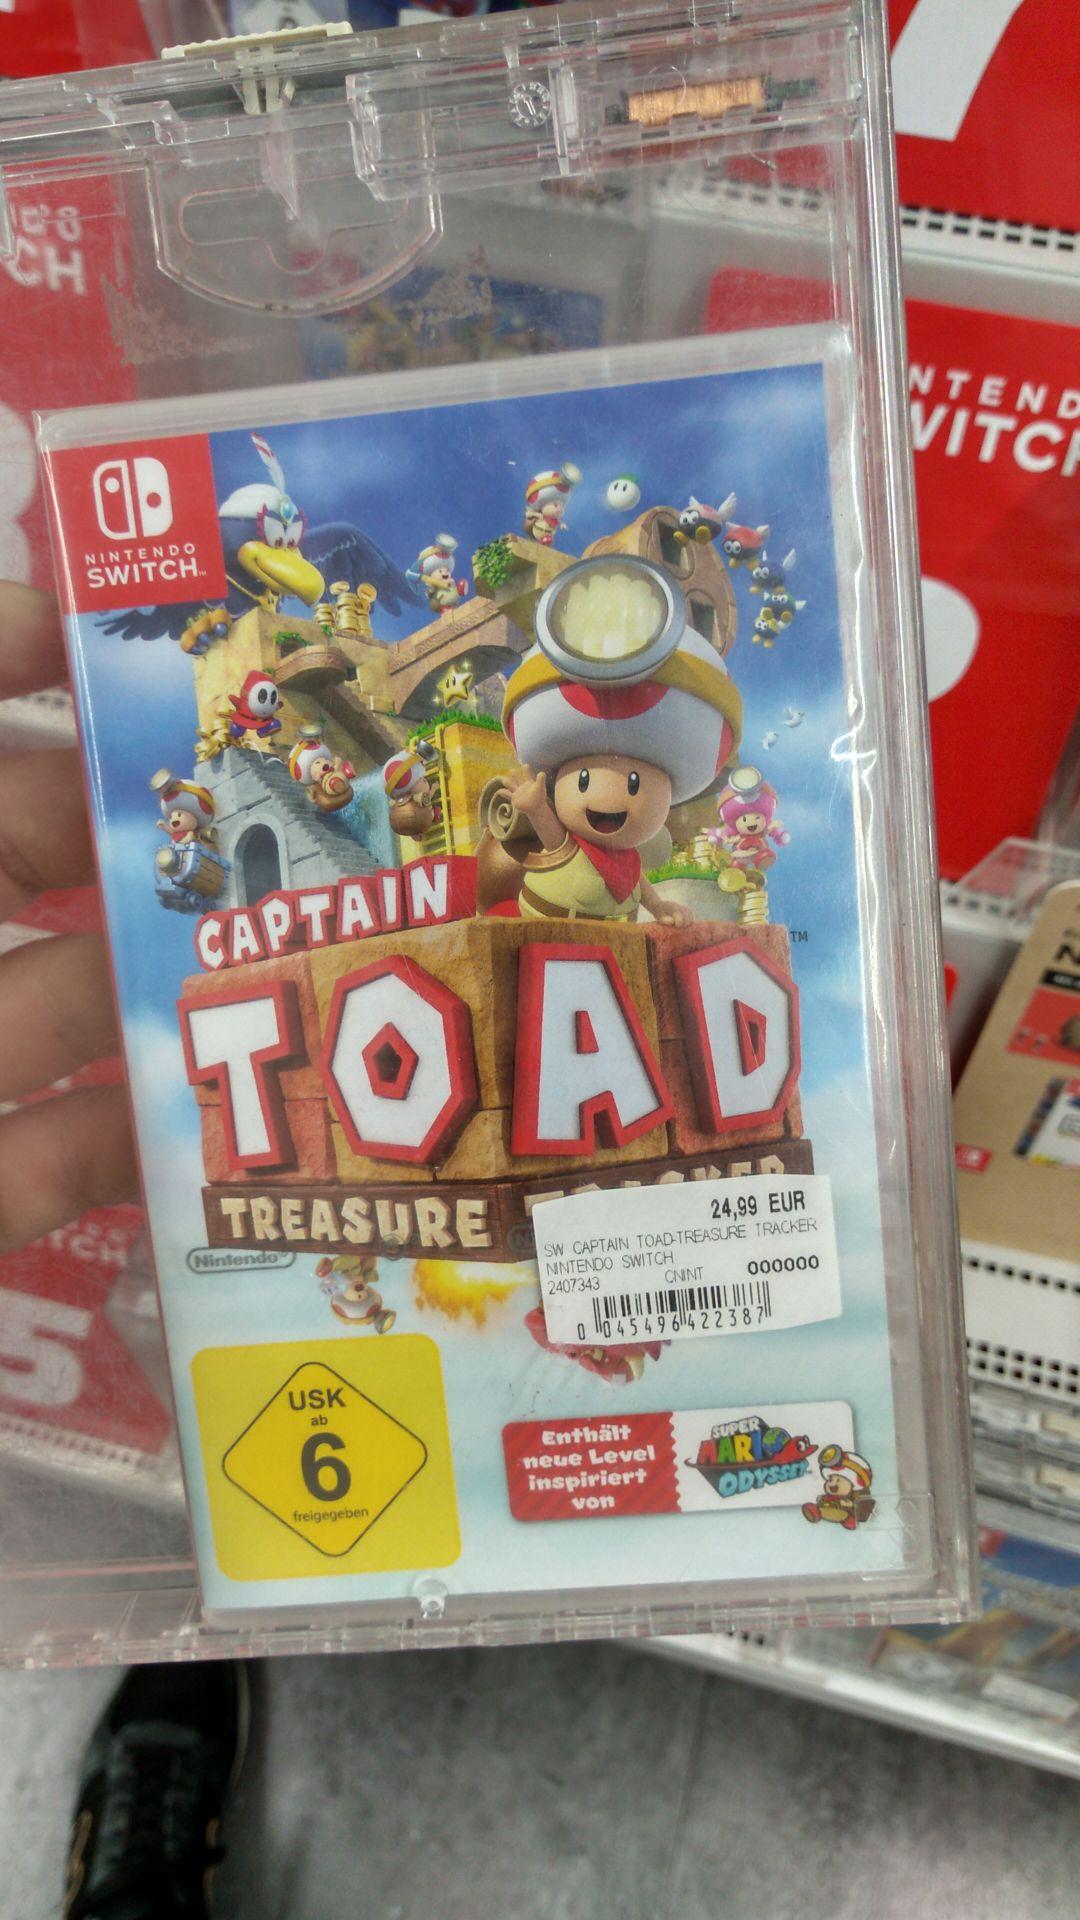 [LOKAL KÖLN] Cpt. Toad Treasure Tracker (Switch) Media Markt Köln Hohe Straße